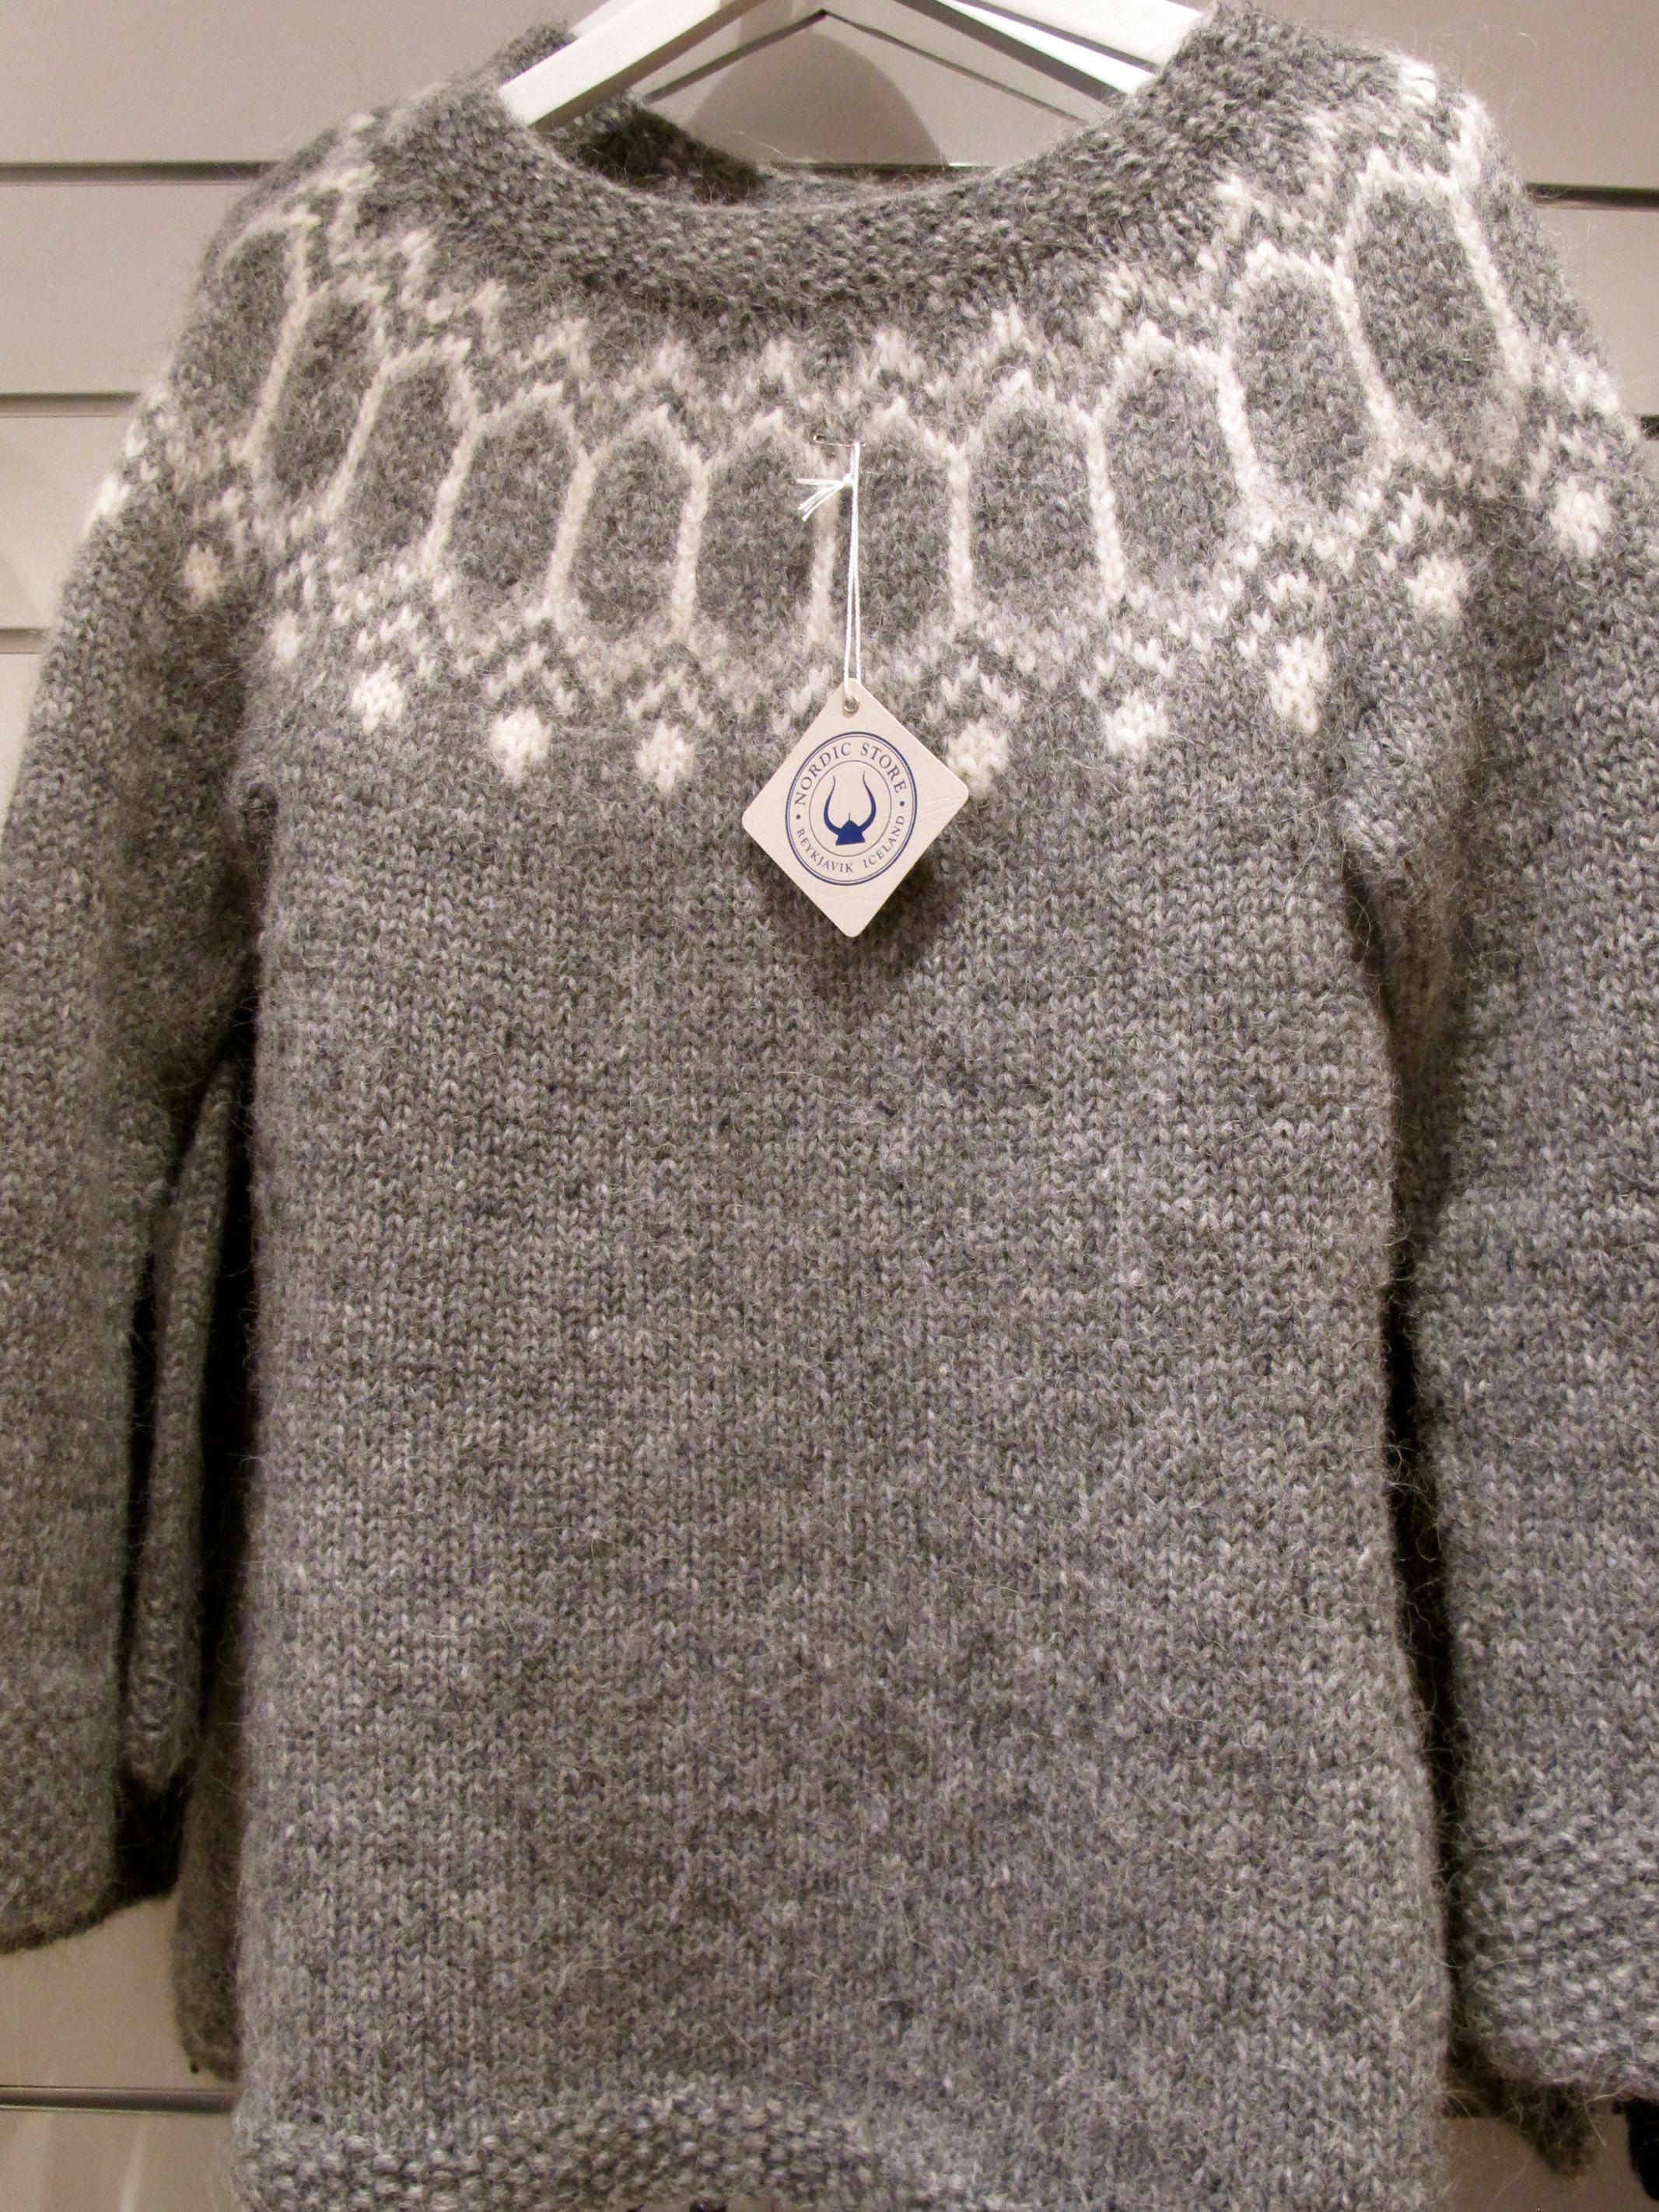 Sweaters - Reykjavik - Iceland | KNITTING | Pinterest | Reykjavik ...